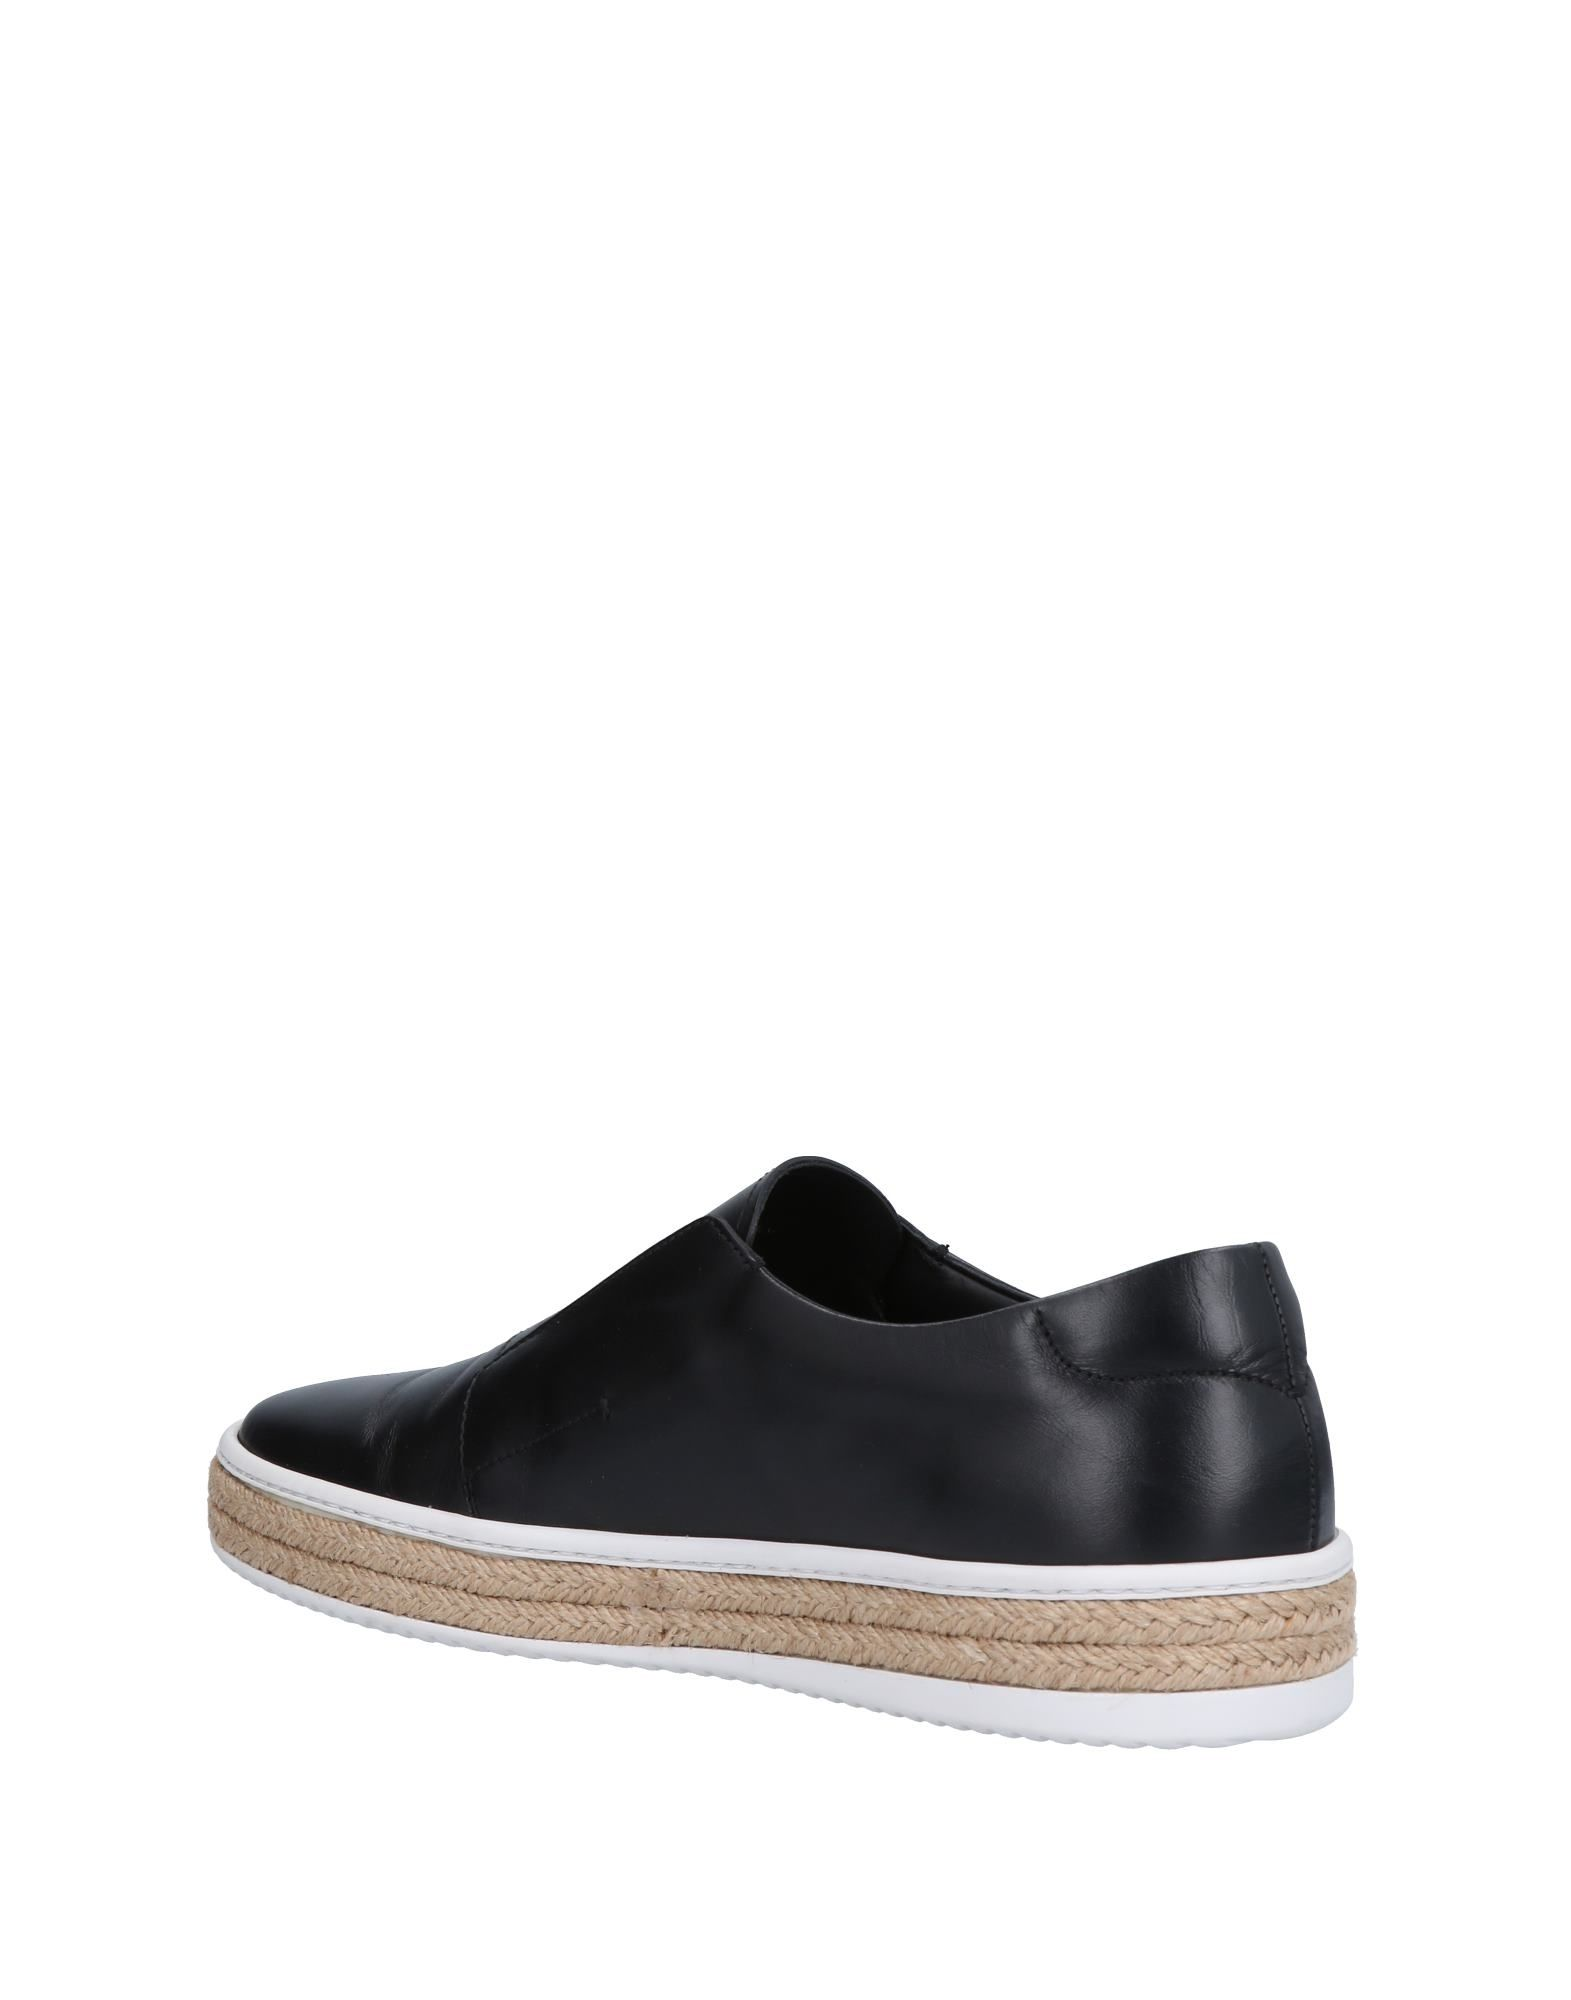 Prada 11492805AI Sport Sneakers Herren  11492805AI Prada Gute Qualität beliebte Schuhe 905bd6